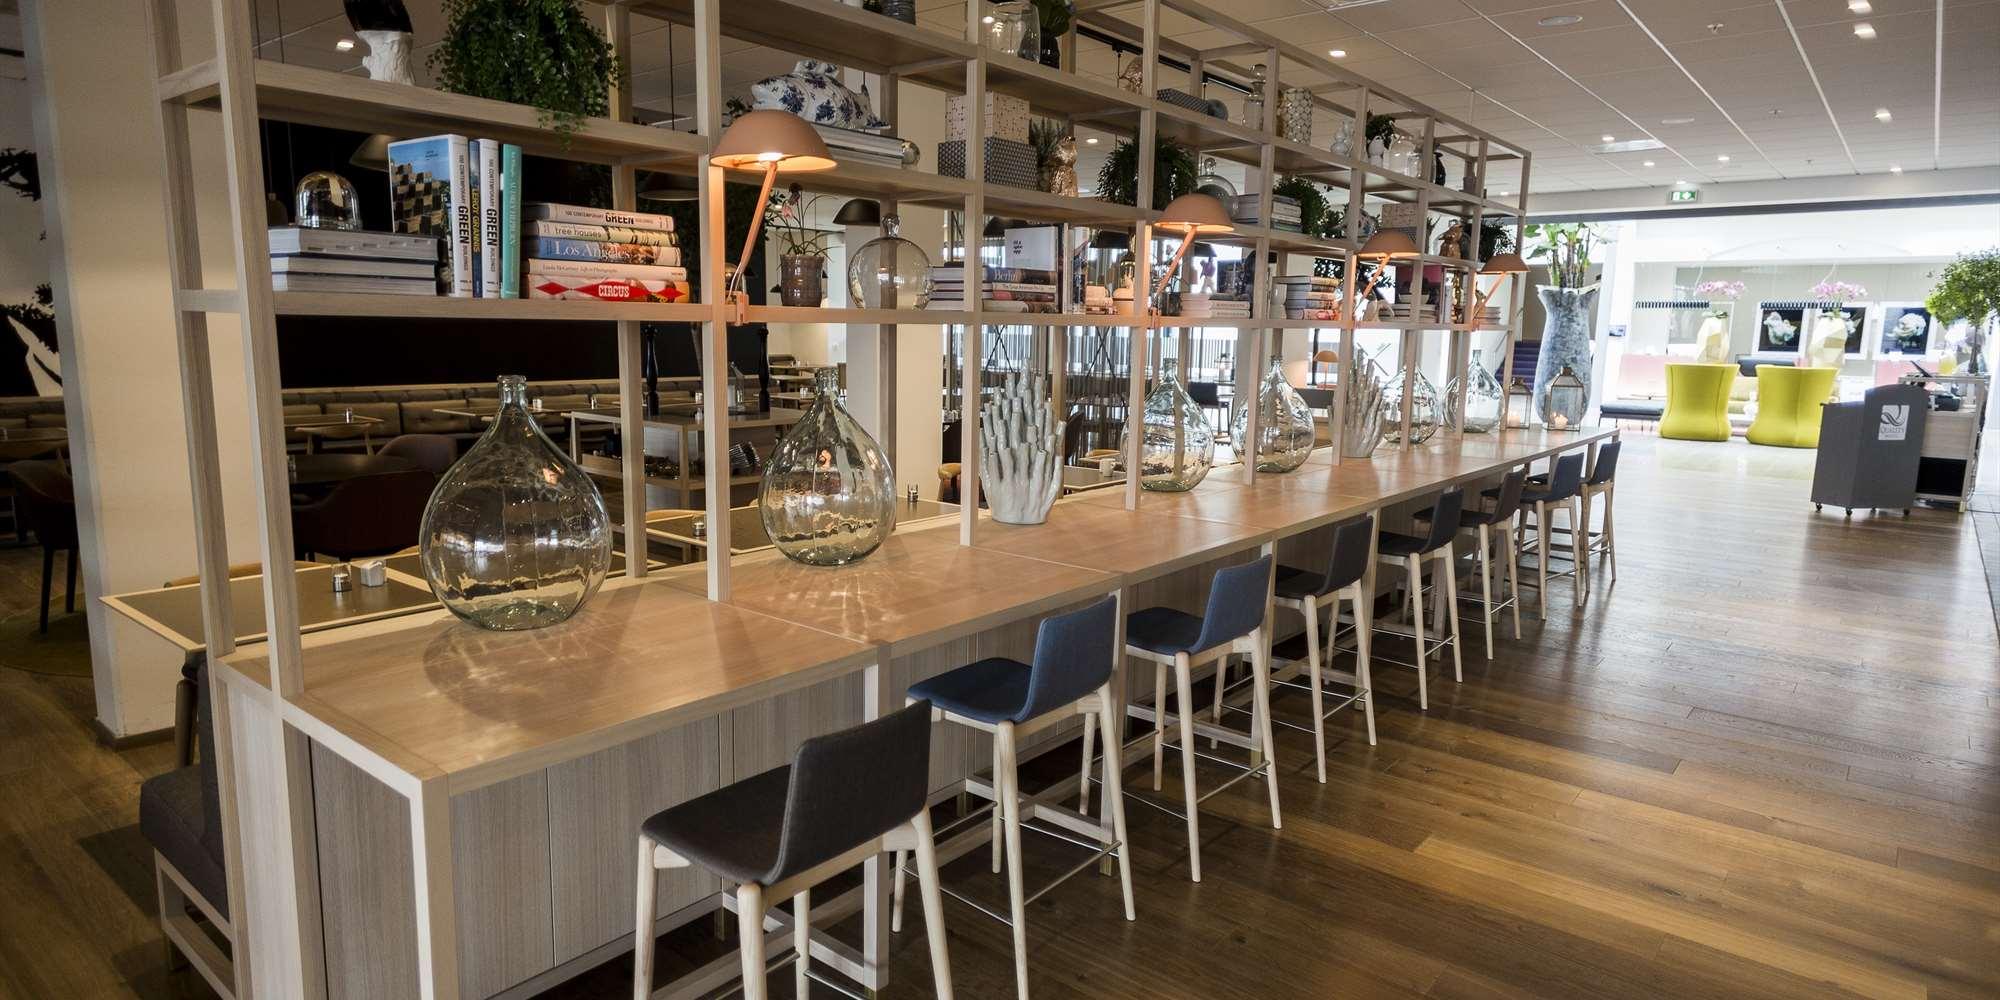 Brasserie X at Quality Hotel Edvard Grieg